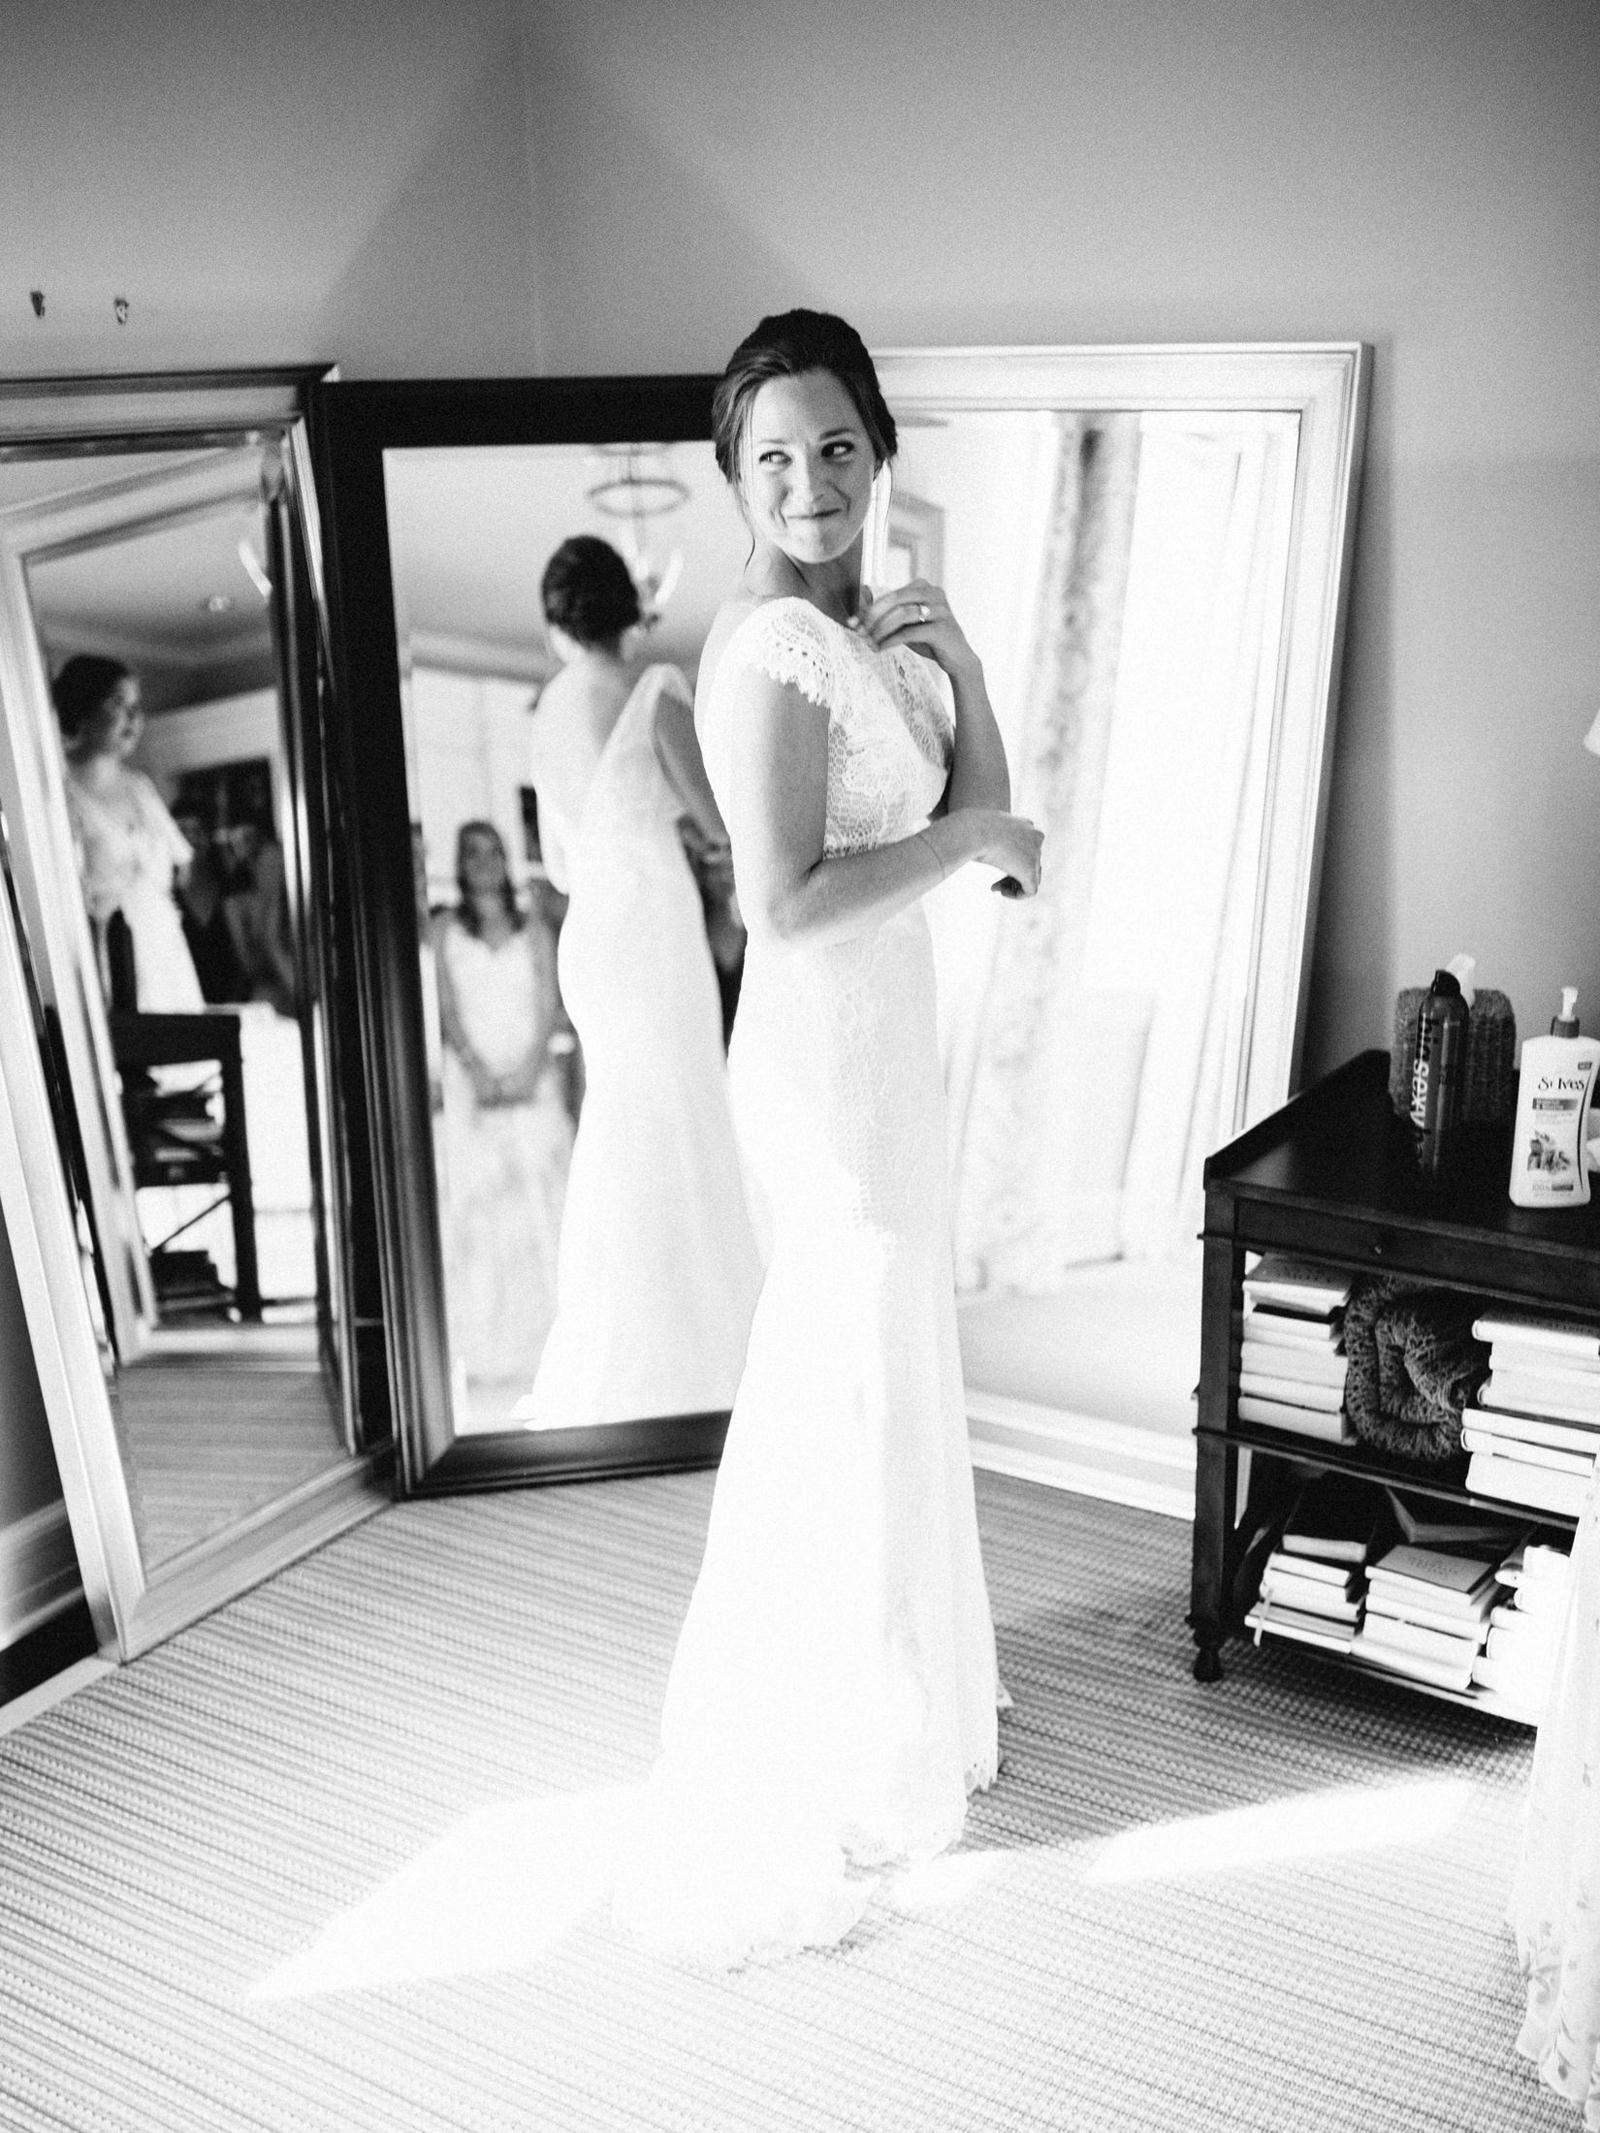 bridgeport-wedding-025 BRIDGEPORT, CONNECTICUT BACKYARD WEDDING